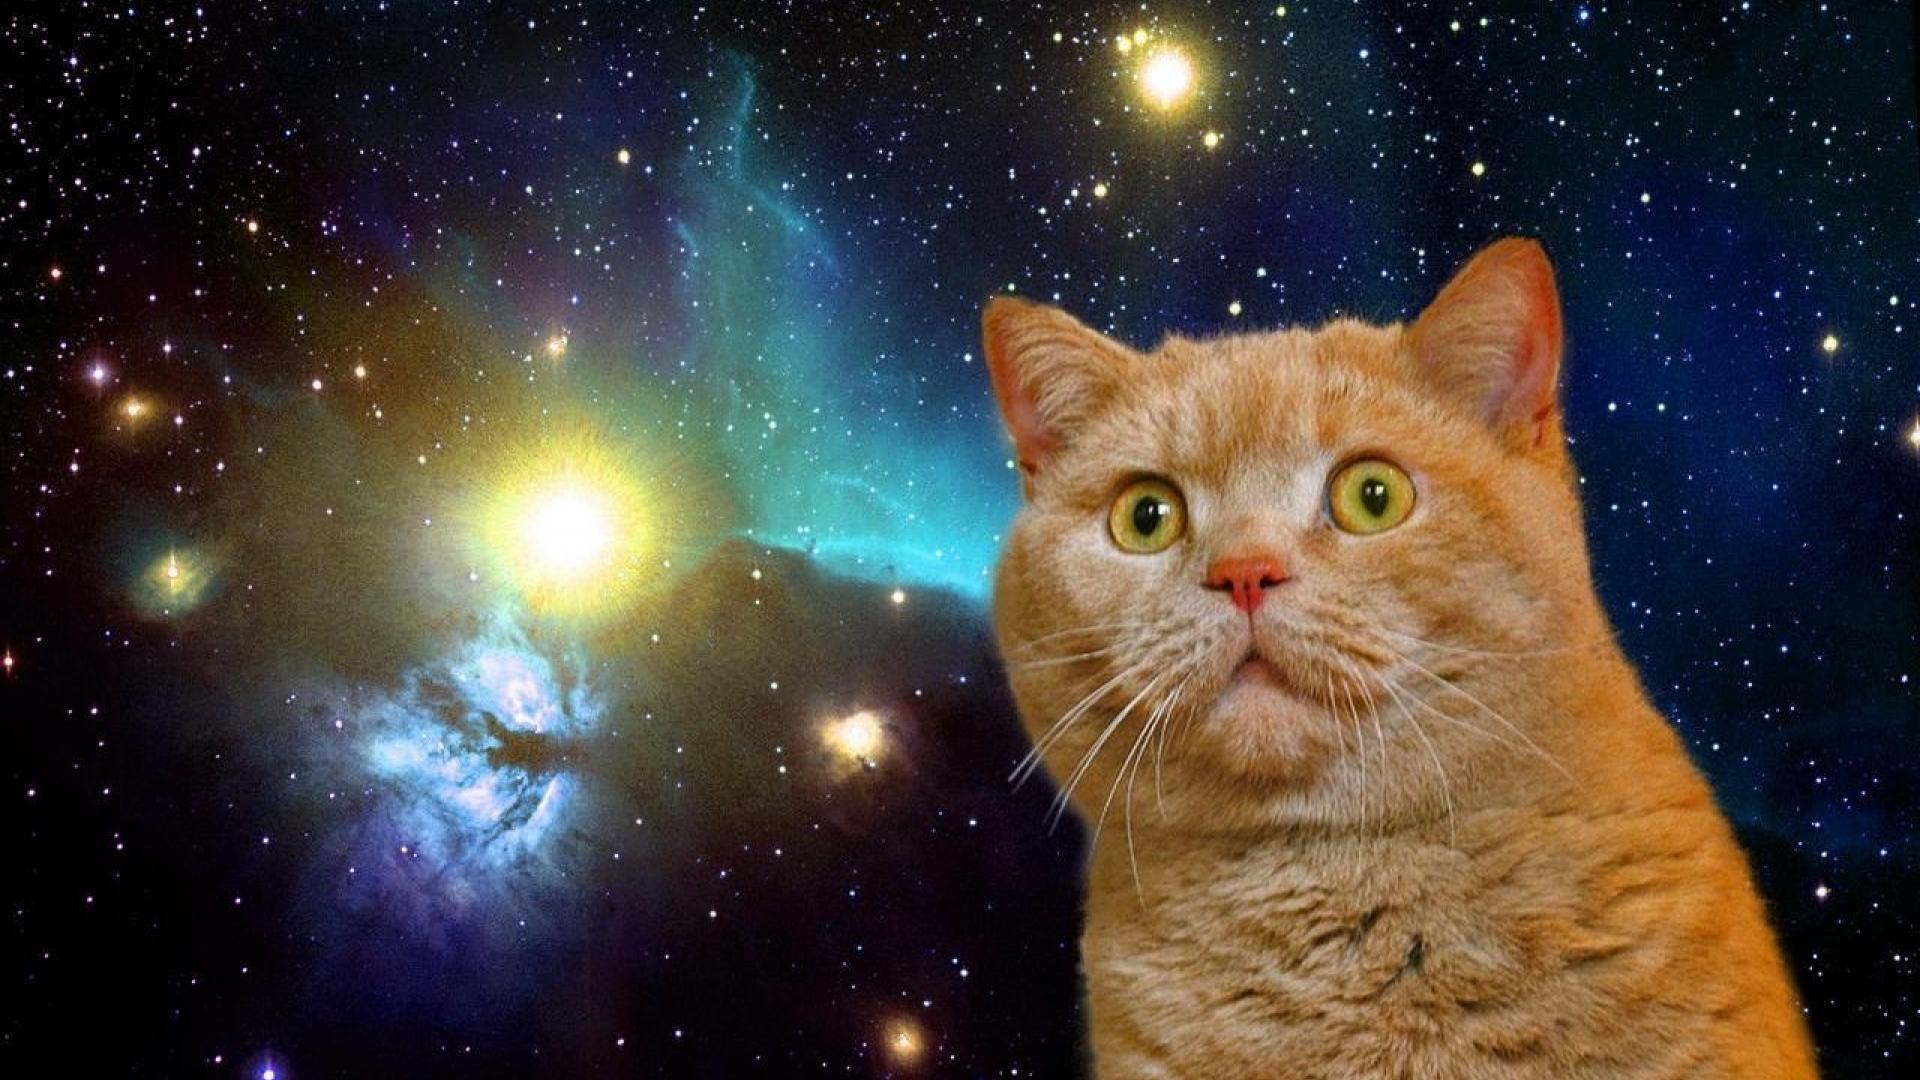 Cat in space wallpaper 1280x783 HQ WALLPAPER   26477 1920x1080